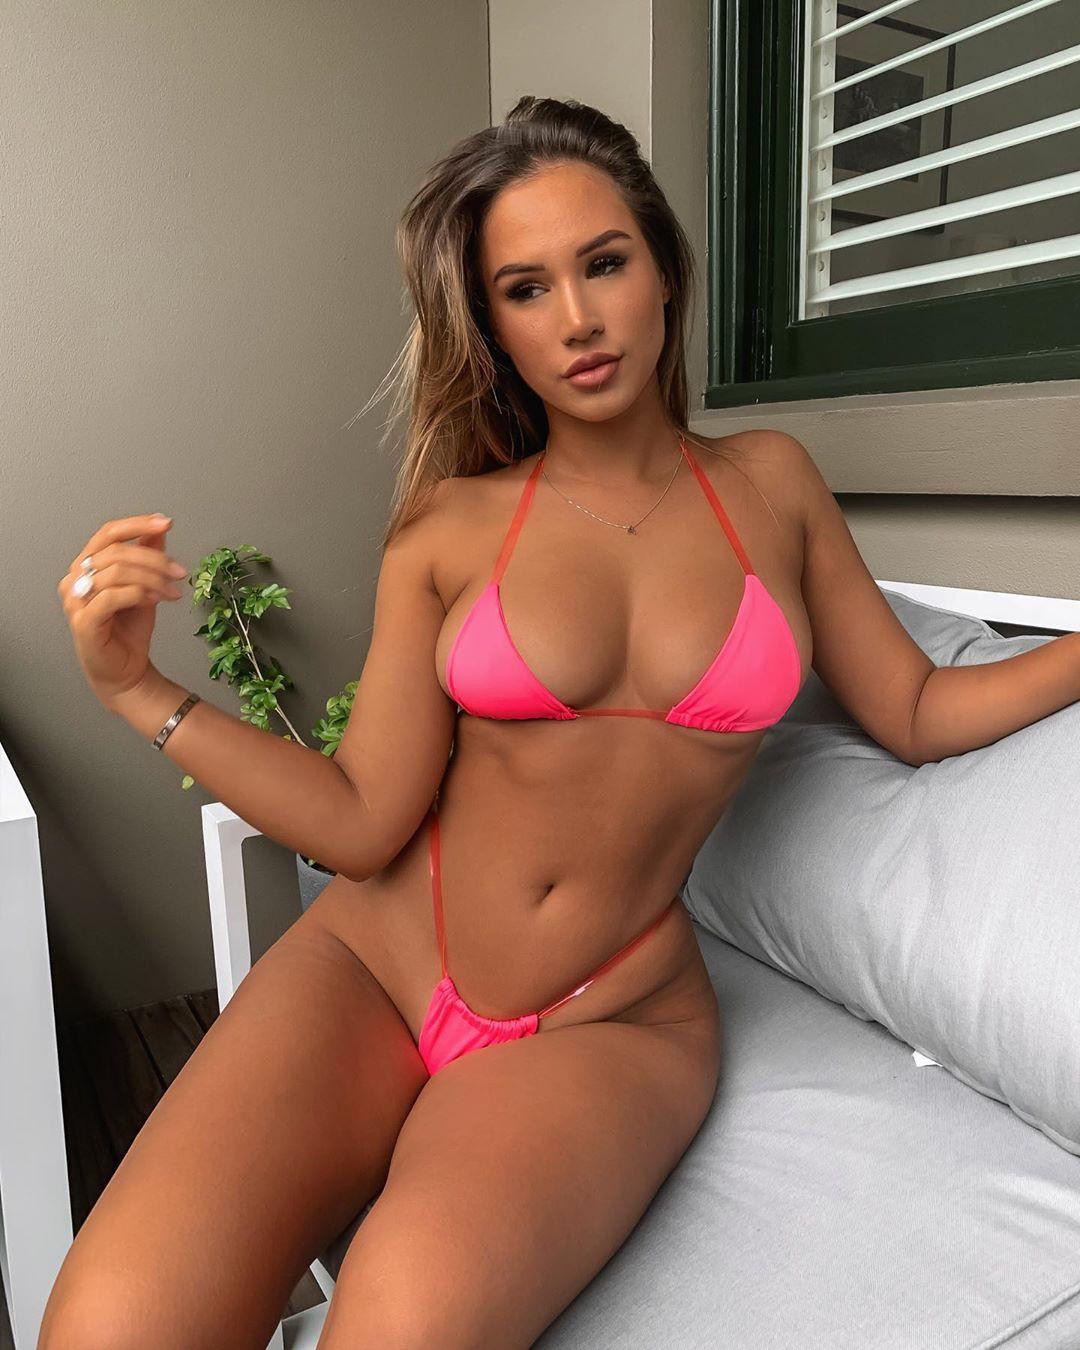 pink undergarment, lingerie, bikini